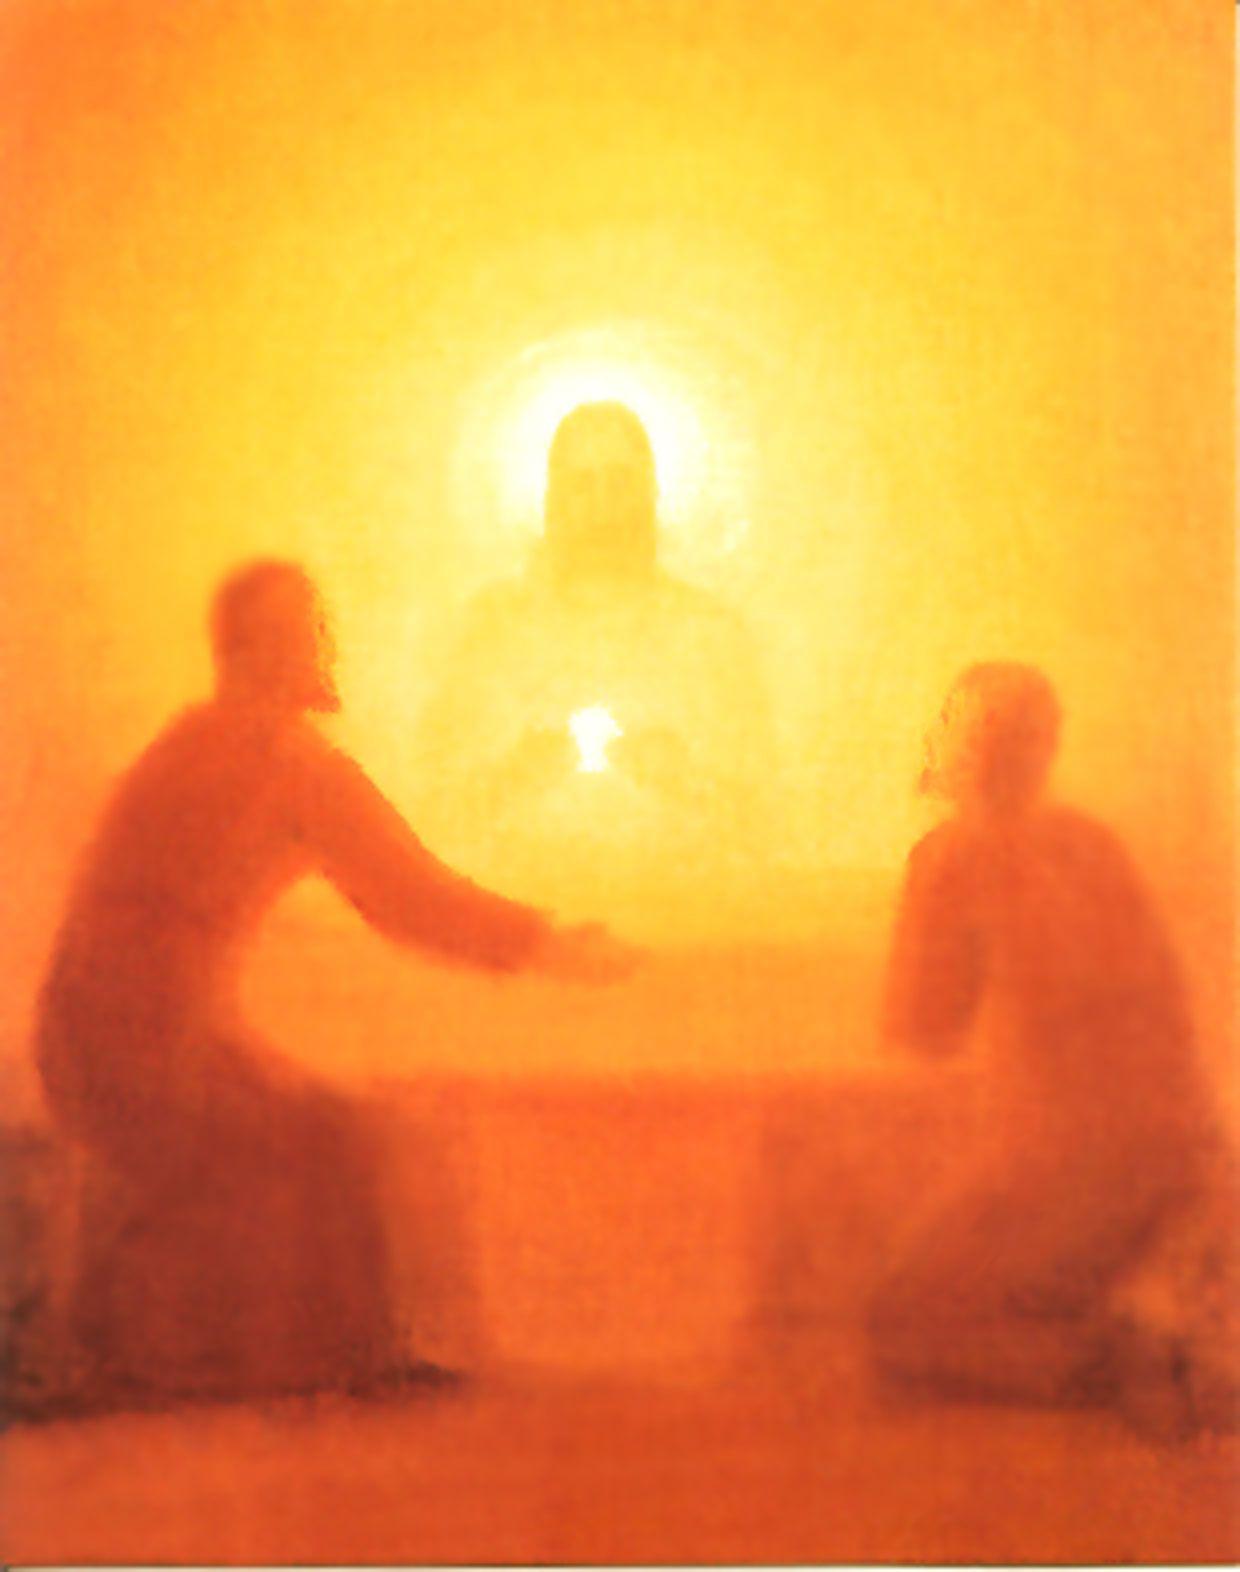 ladislav zaborsky | Catholic artist, Catholic, Jesus painting